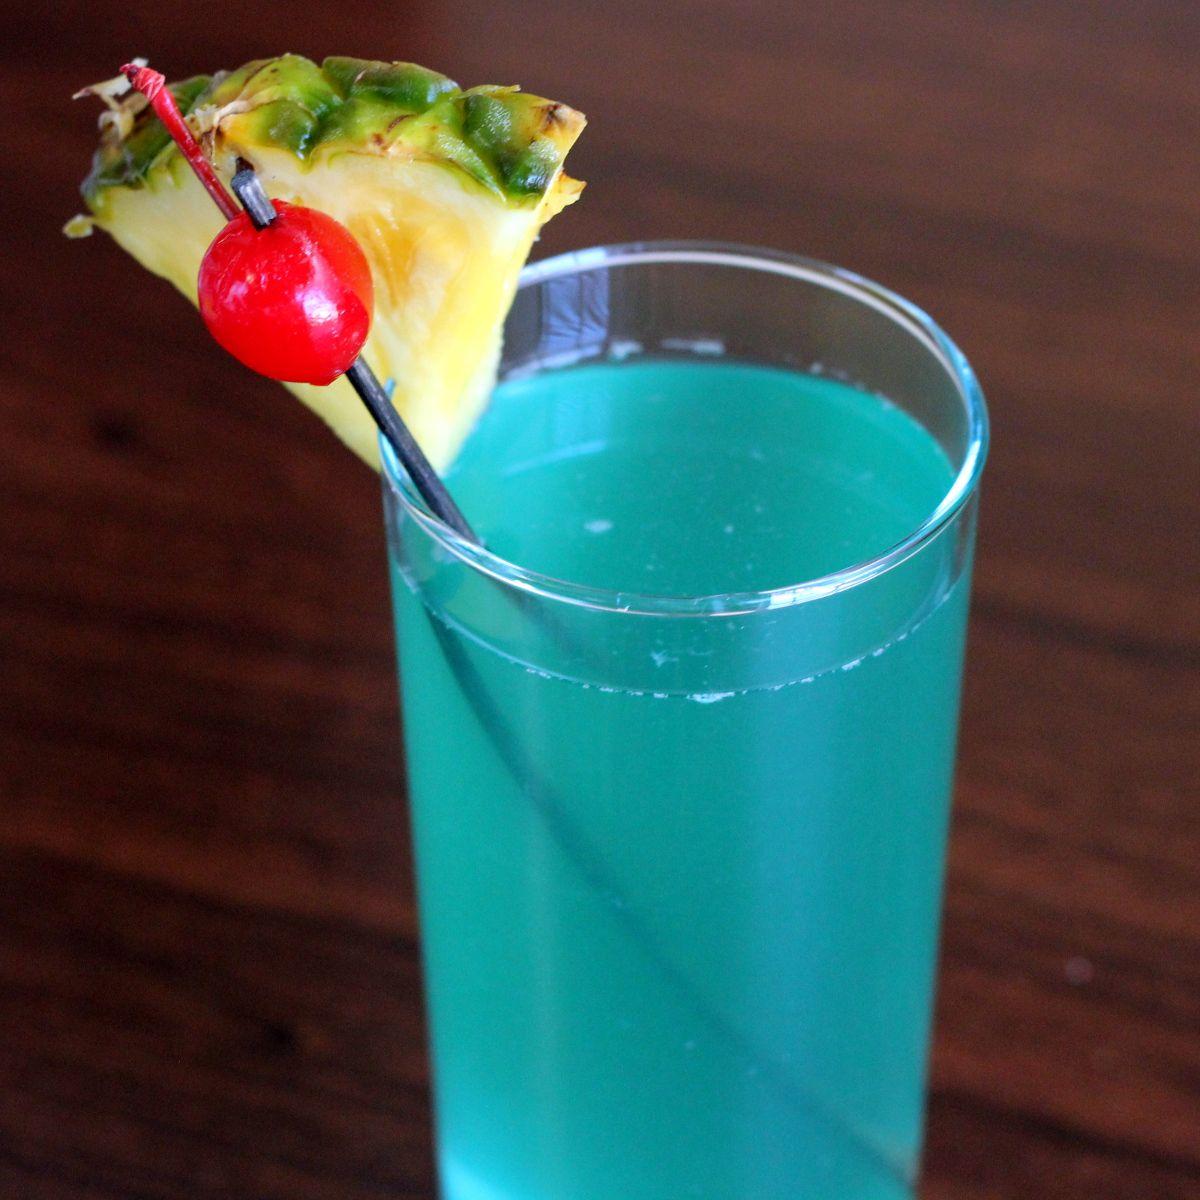 Midori And Malibu Drink Recipes